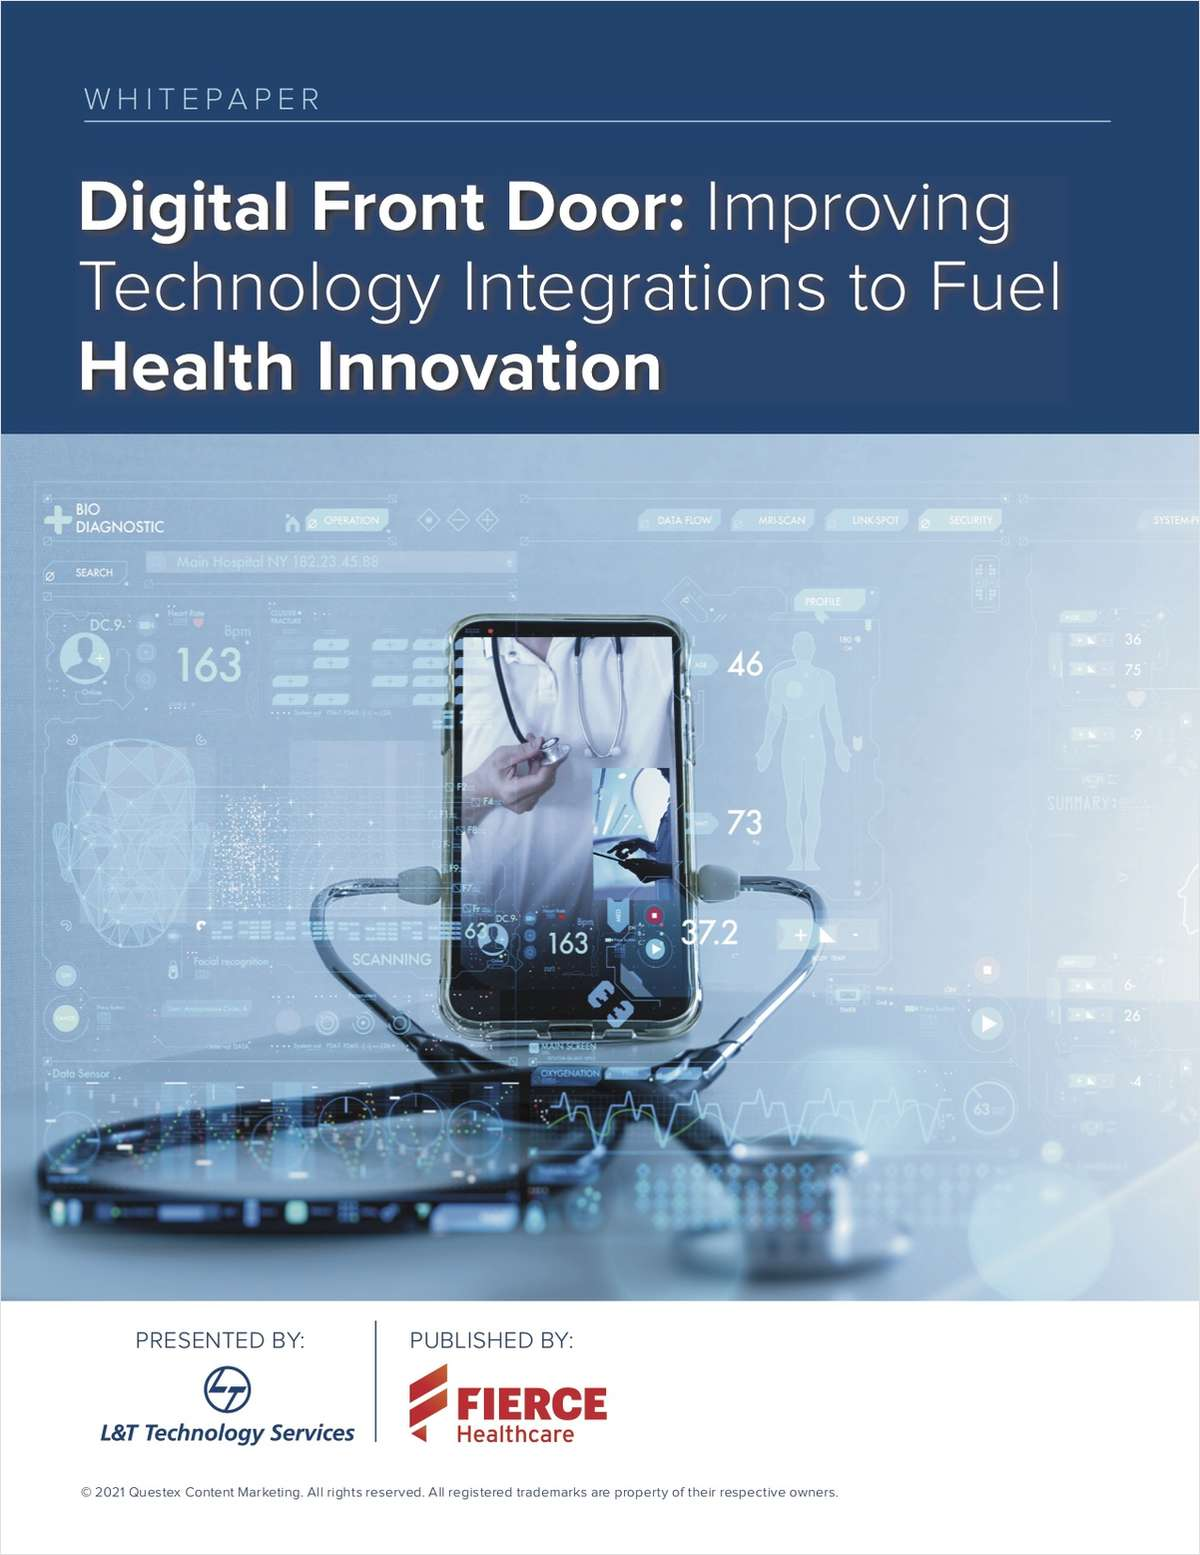 Digital Front Door: Improving Technology Integrations to Fuel Health Innovation